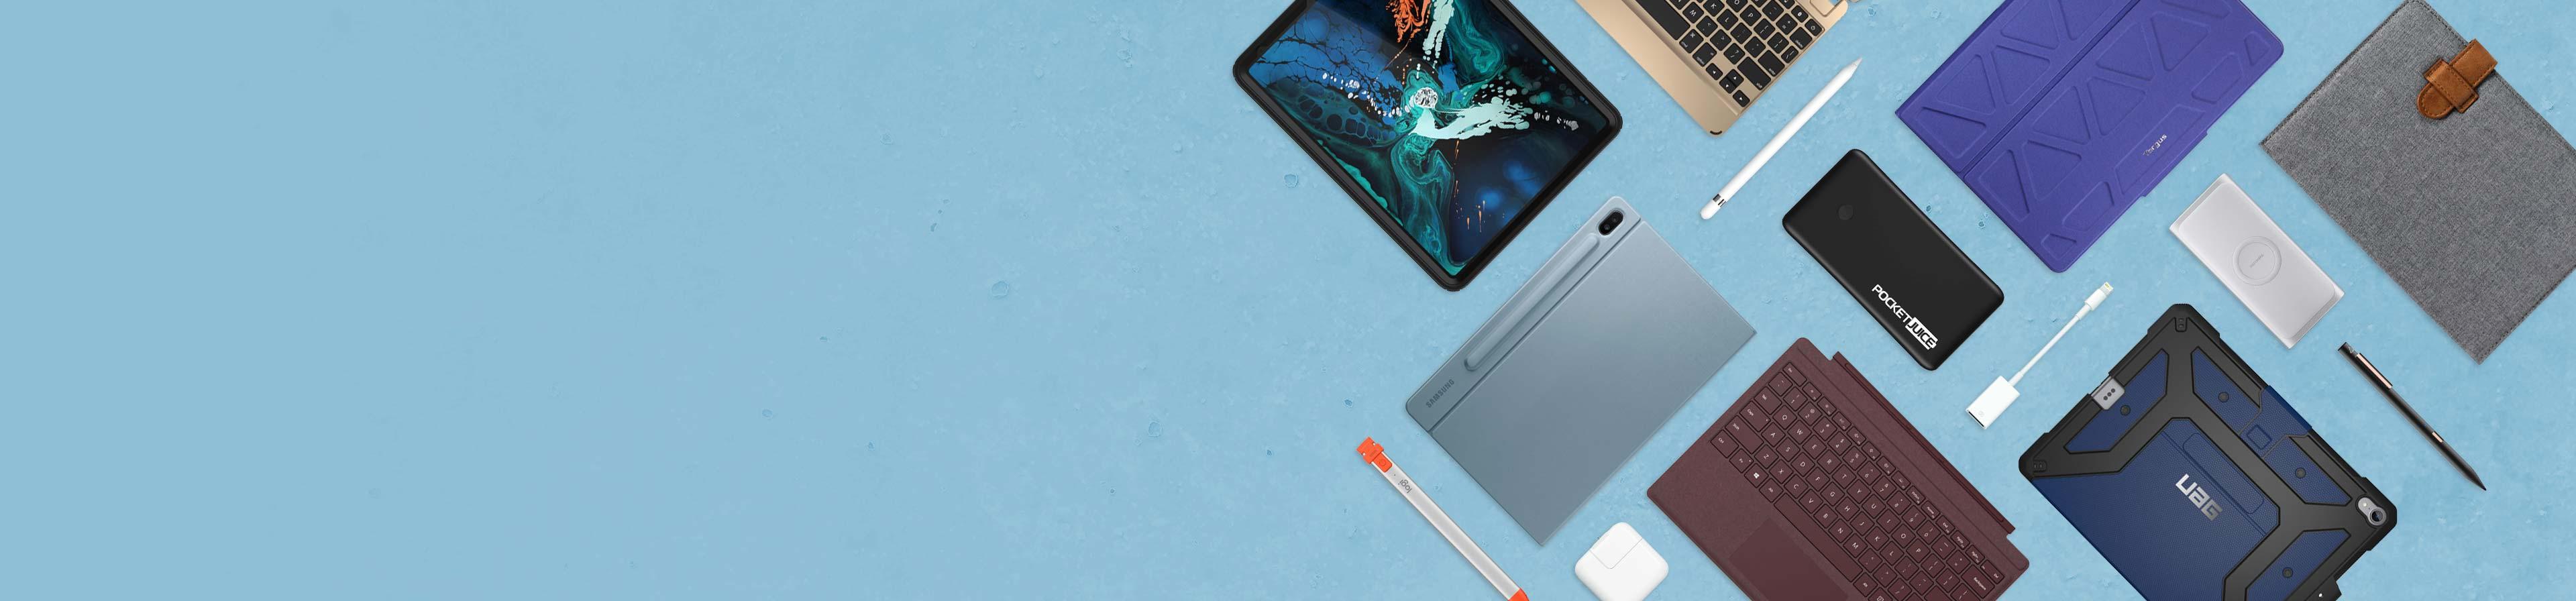 Tablet Ipad Accessories Best Buy Canada